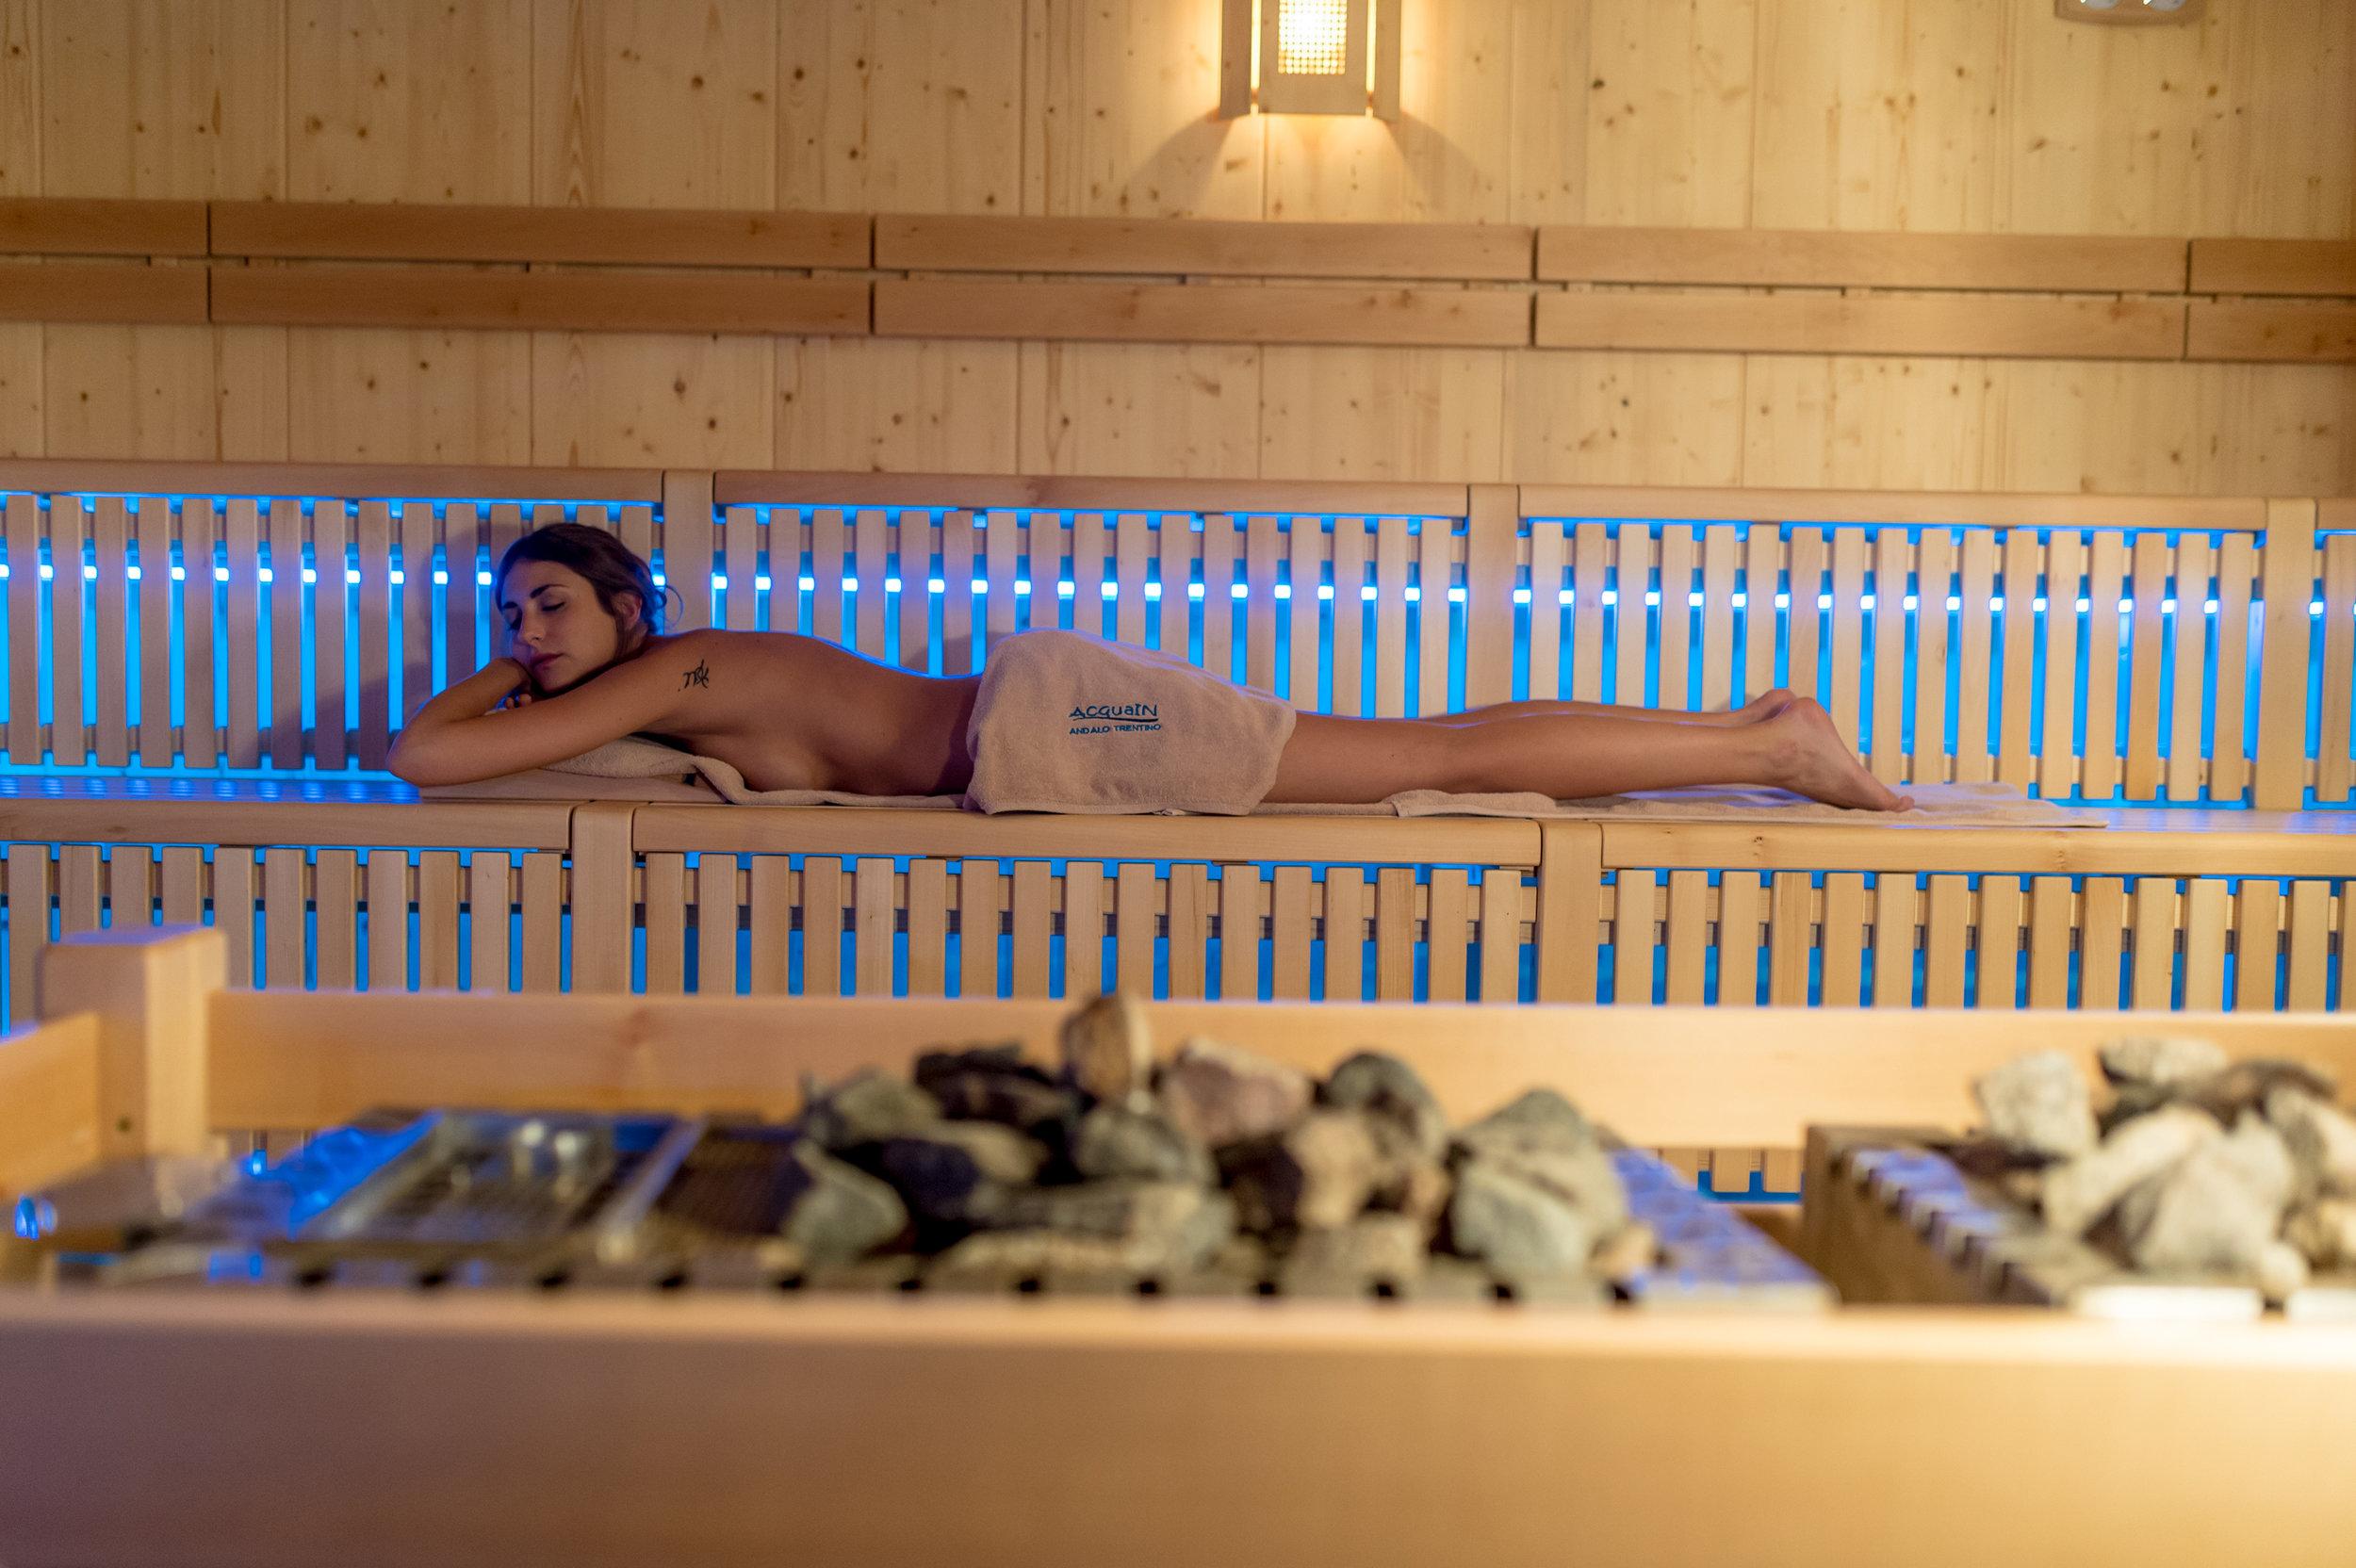 2016_PHMatteoDeStefano_Andalo_Life_parco_Acquain_Trentino_Alto_Adige_Paganella_Dolomiti_Spa_Wellness_Benessere_Saune_Sauna_aufguss_102.jpg